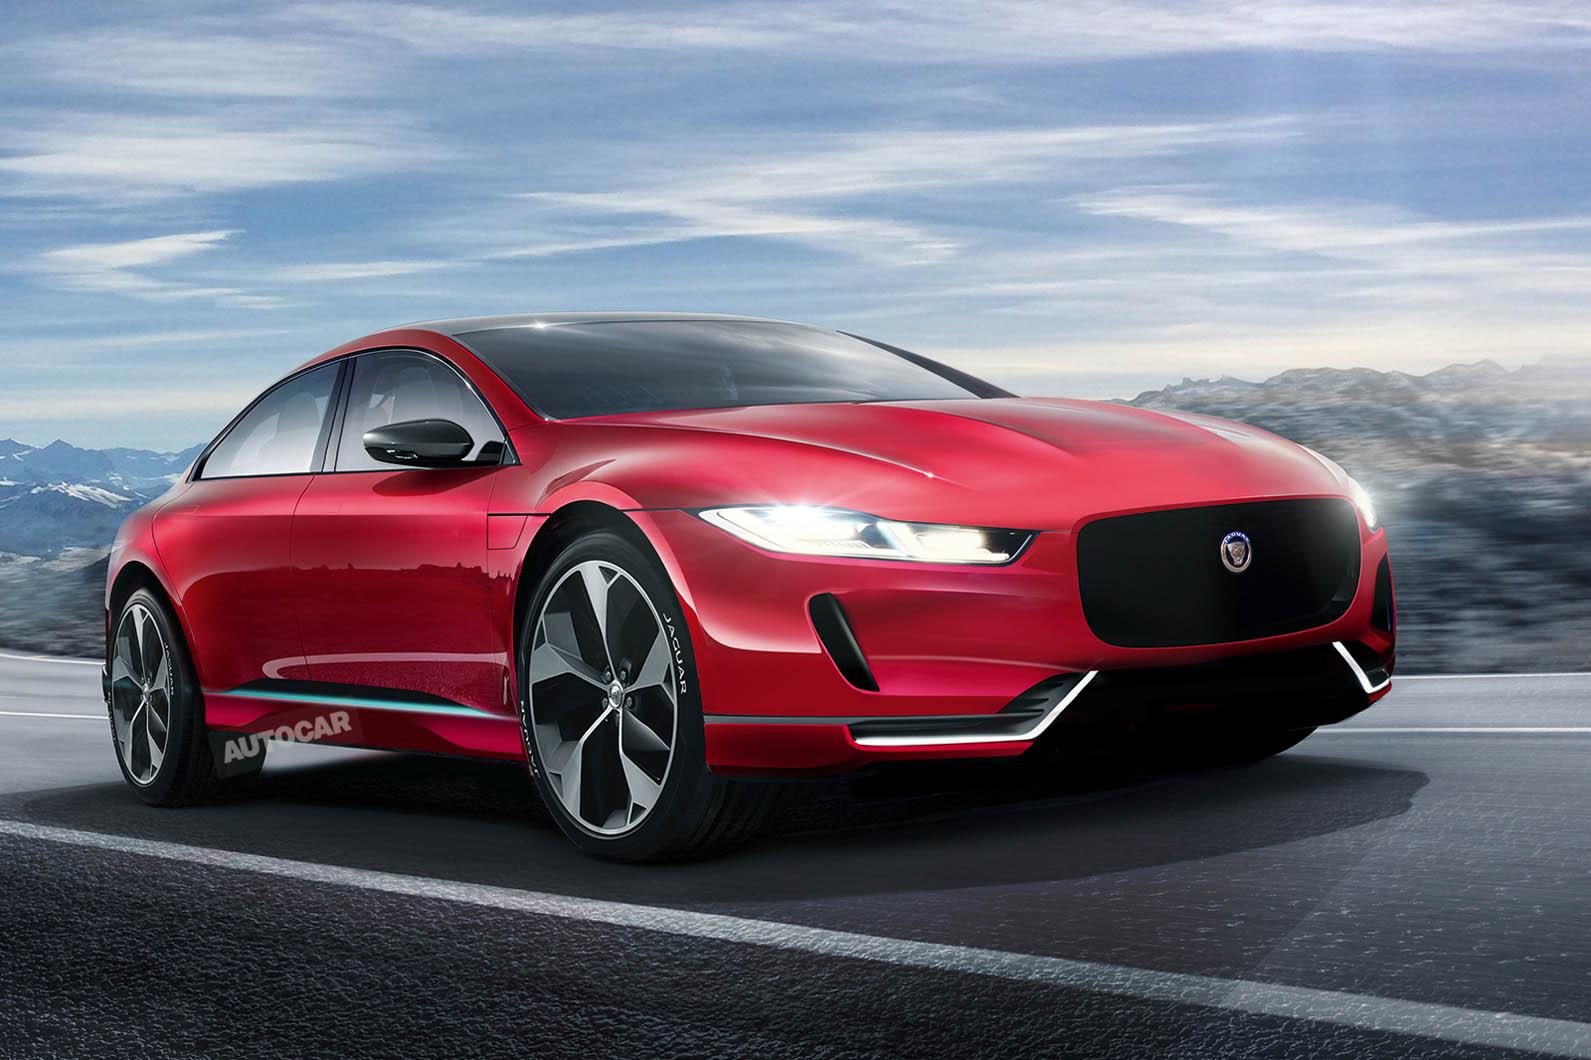 2019 Jaguar XJ to be reborn as high-tech electric flagship | Autocar